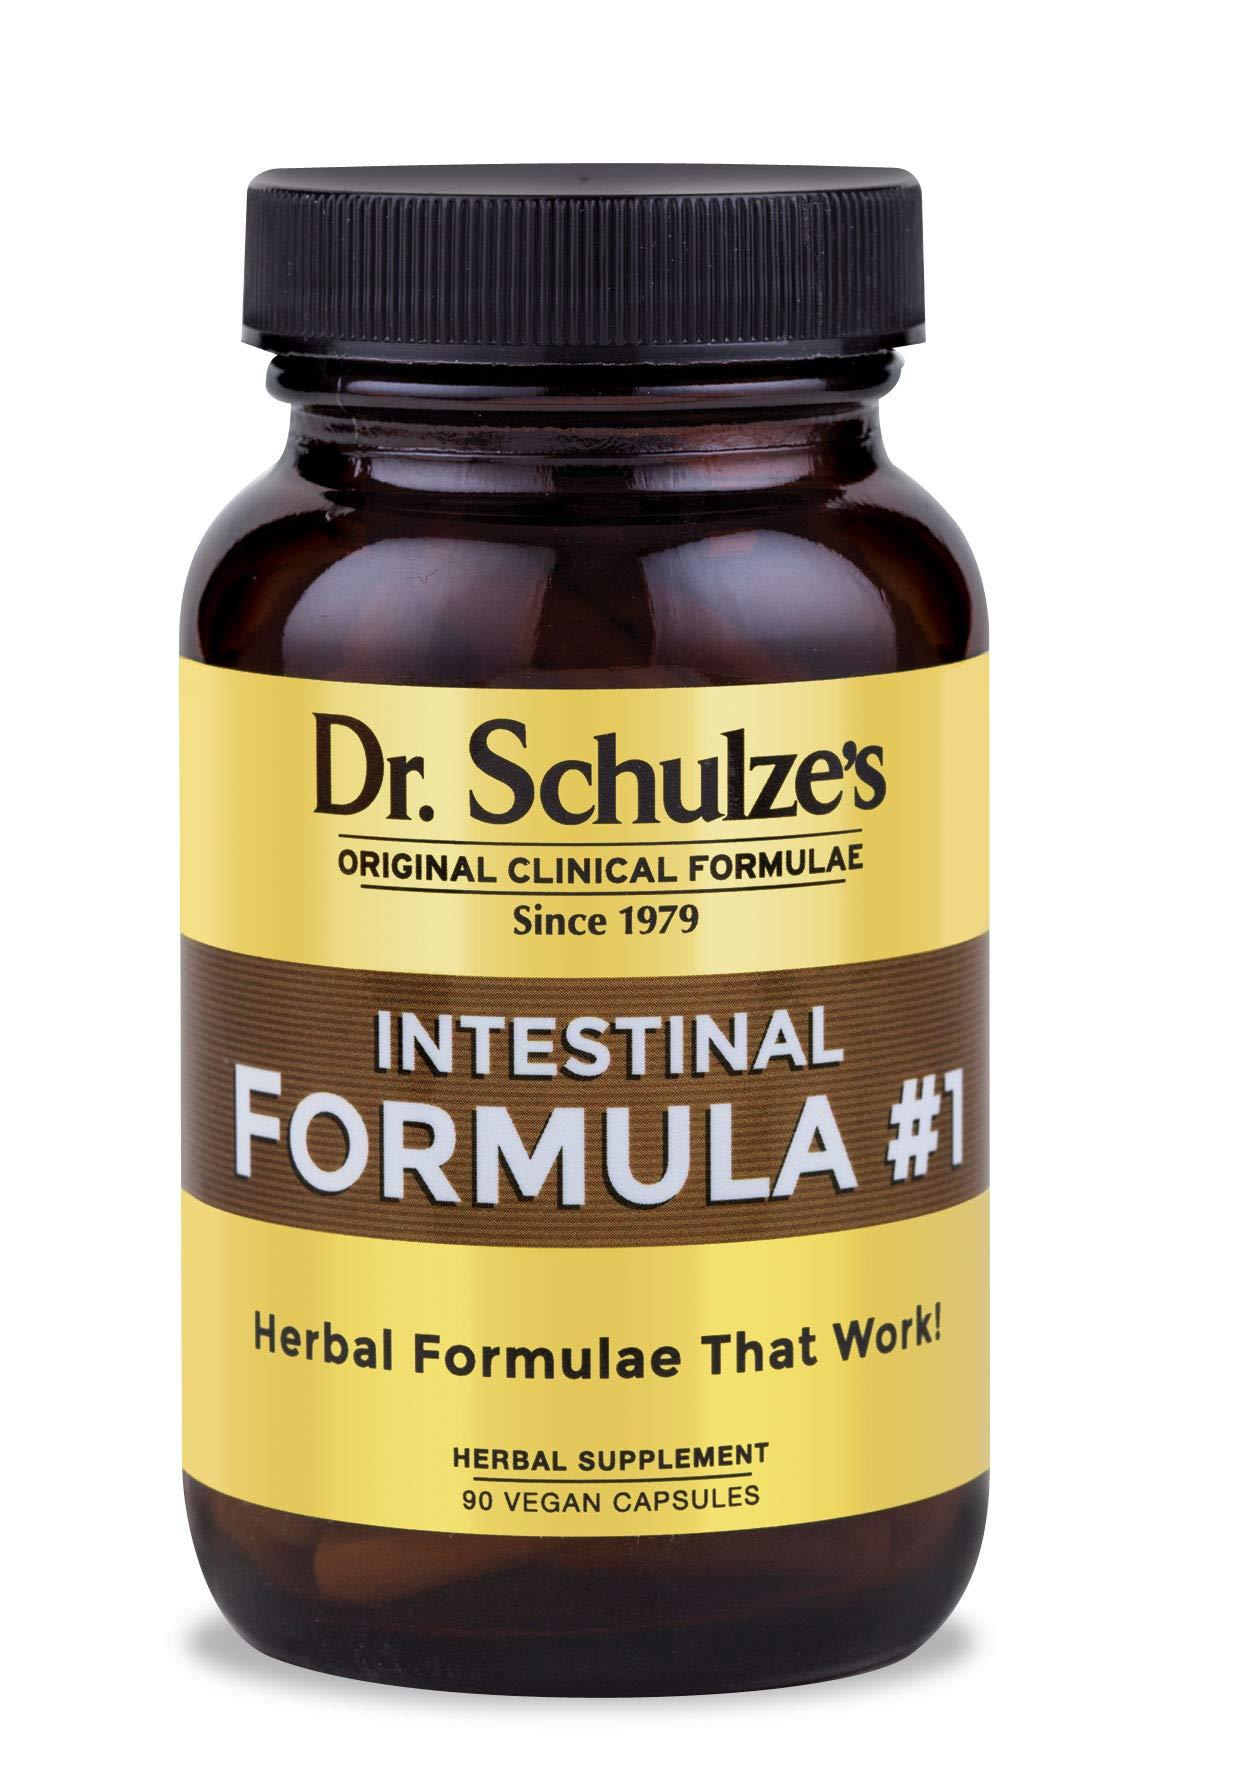 Dr. Schulze's Colon Bowel Cleanse; Intestinal Formula #1 - All Natural - 90 Count Capsules by Dr. Schulze's